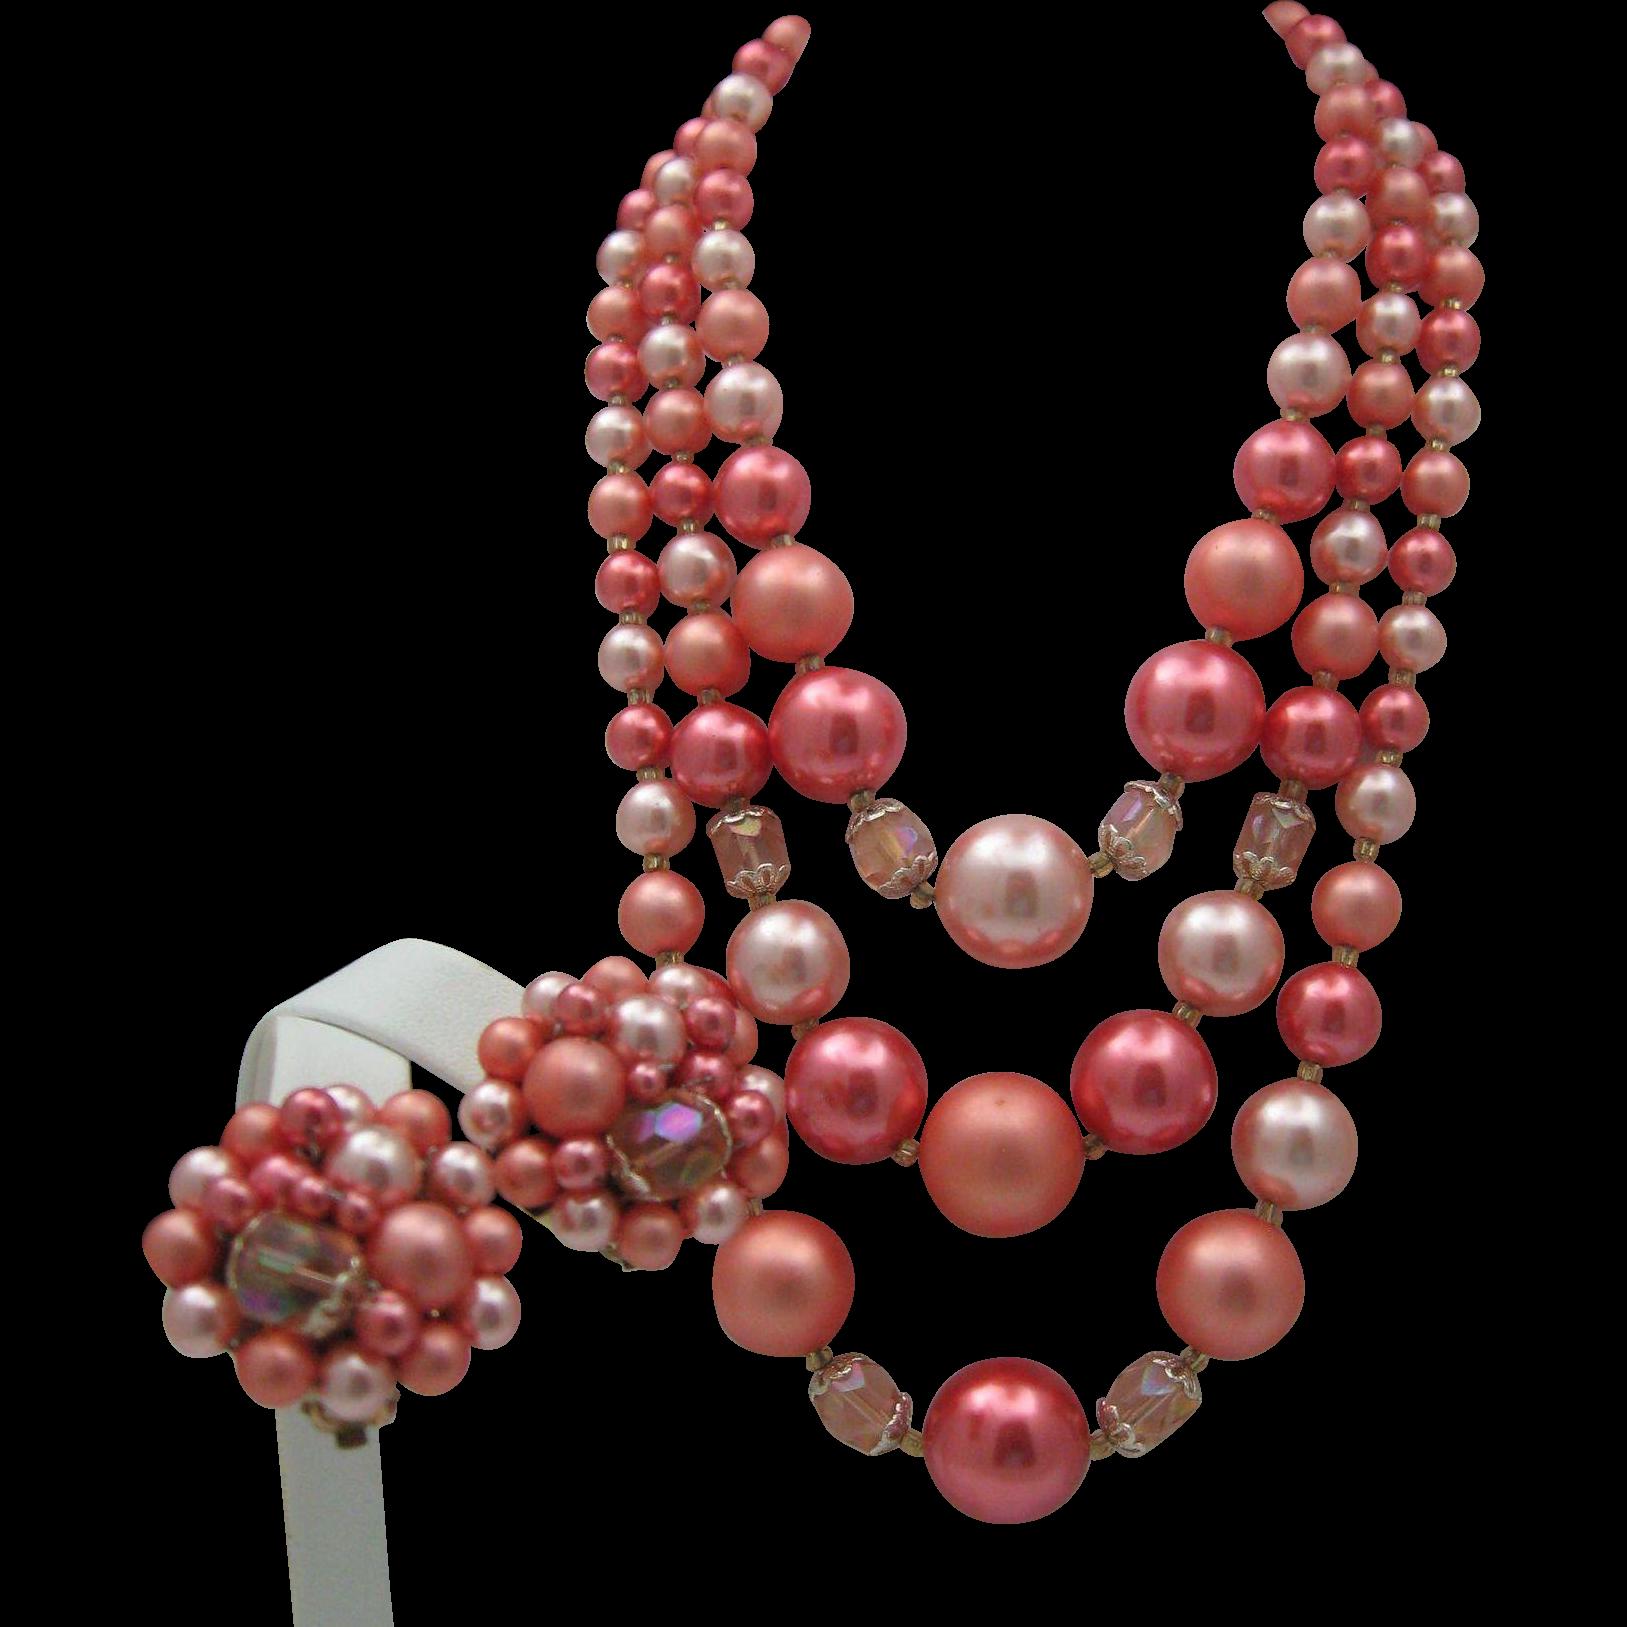 Rose Petal Japan Necklace Earrings Set